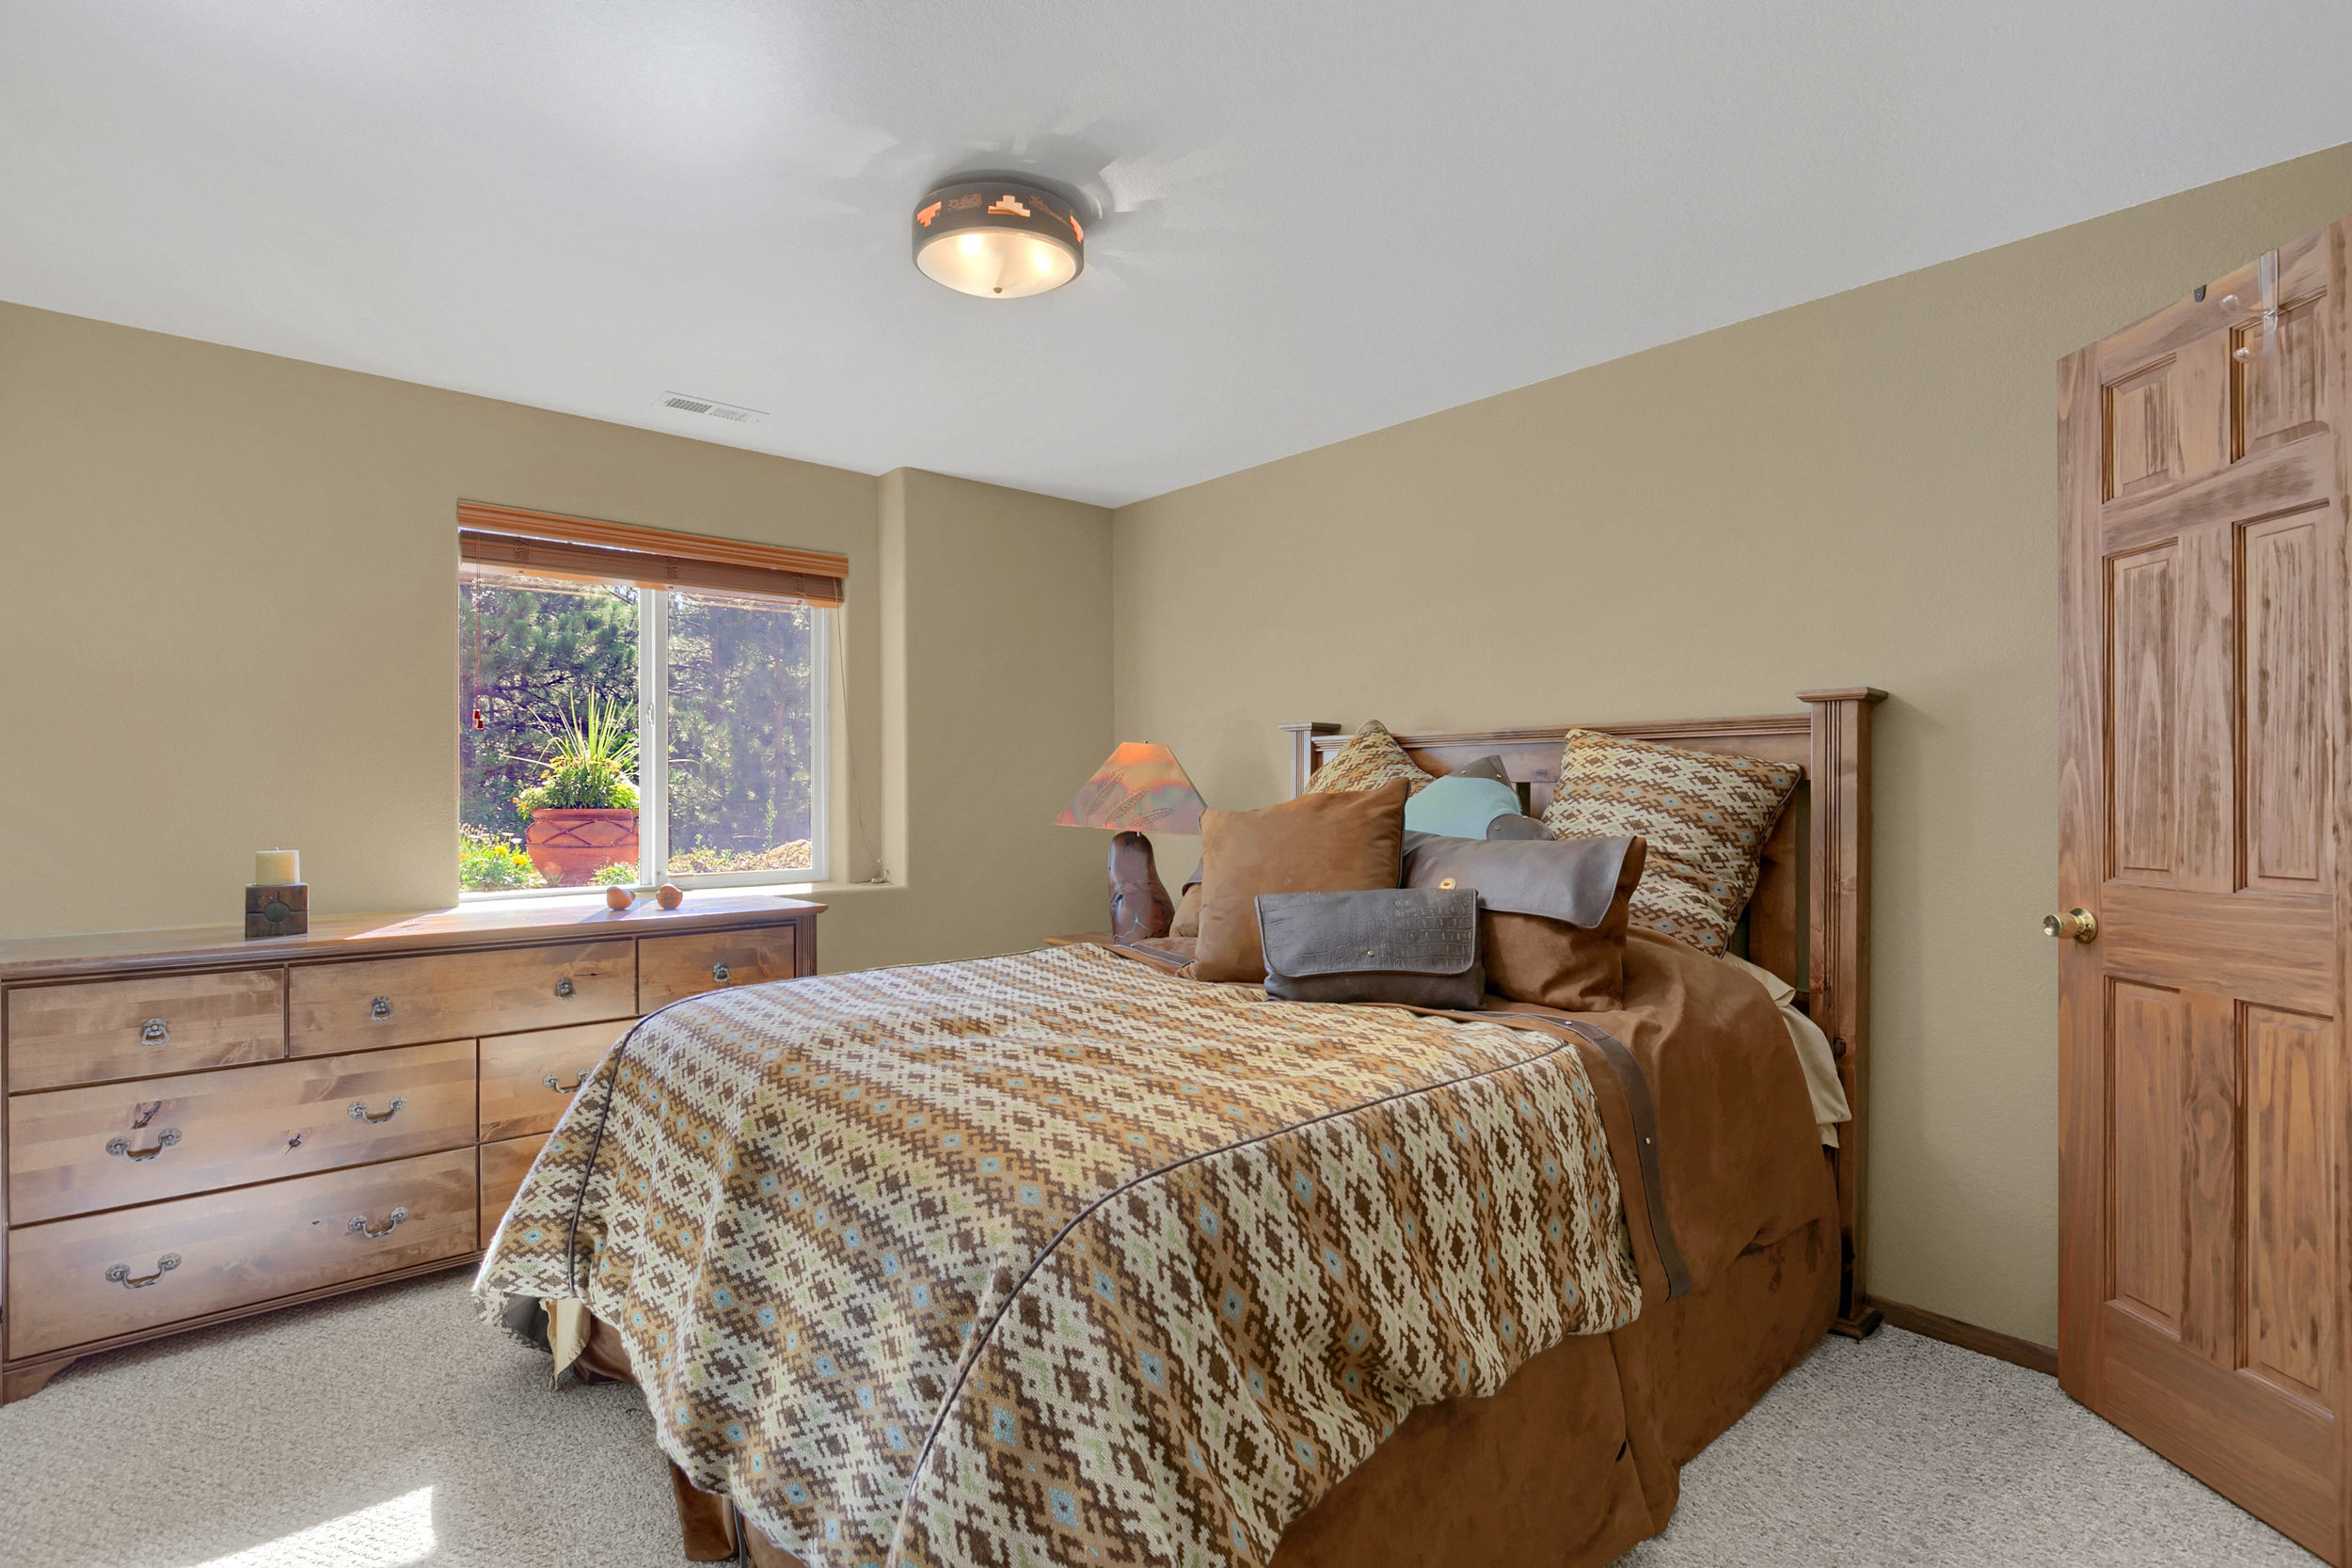 1605 Vickers Drive Colorado-print-031-023-Bedroom-2800x1867-300dpi.jpg